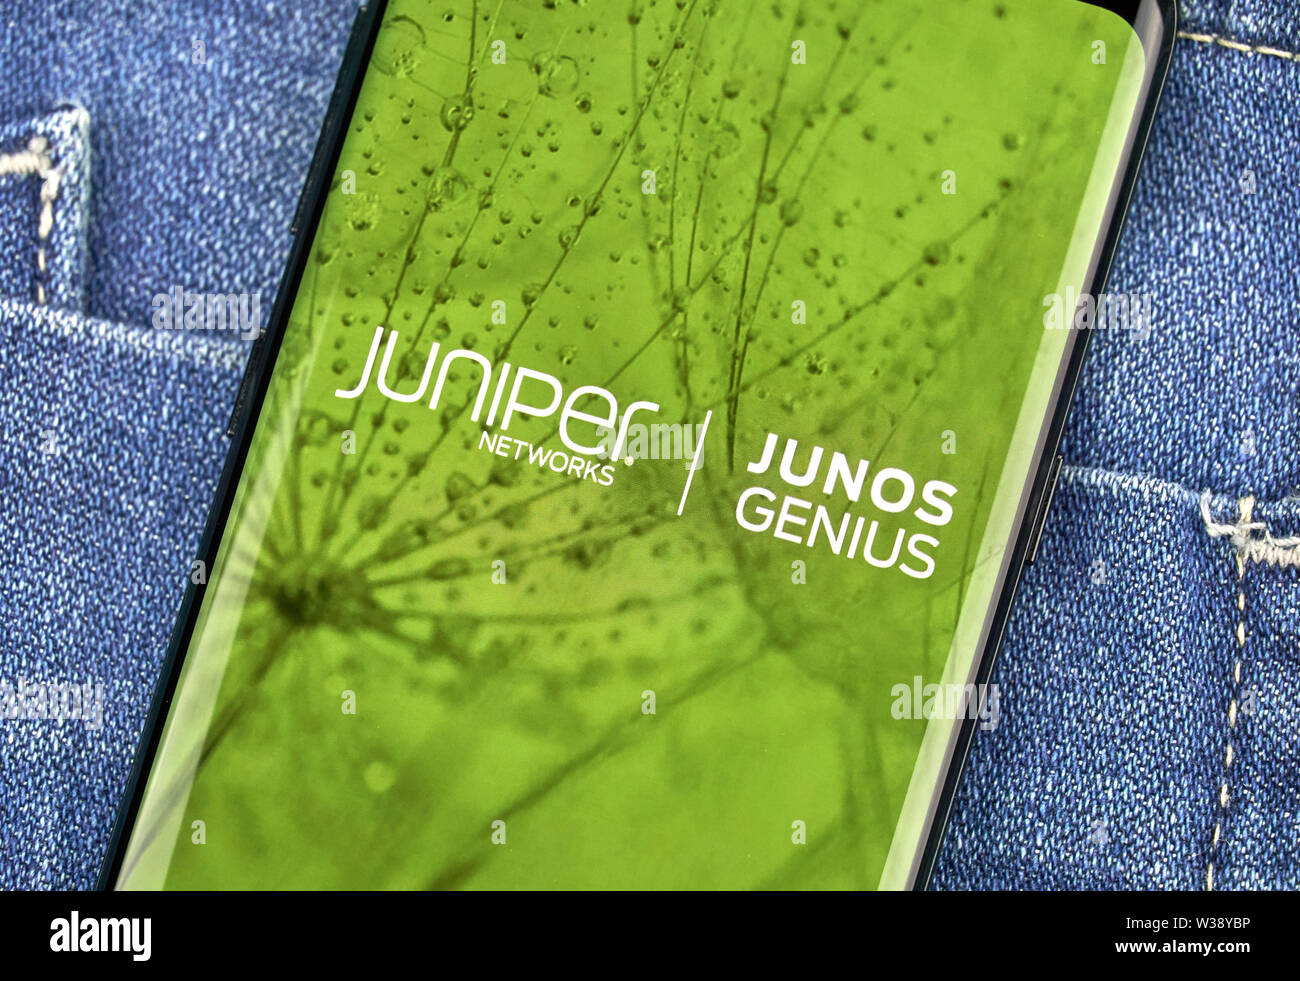 Juniper Networks Stock Photos & Juniper Networks Stock Images - Alamy